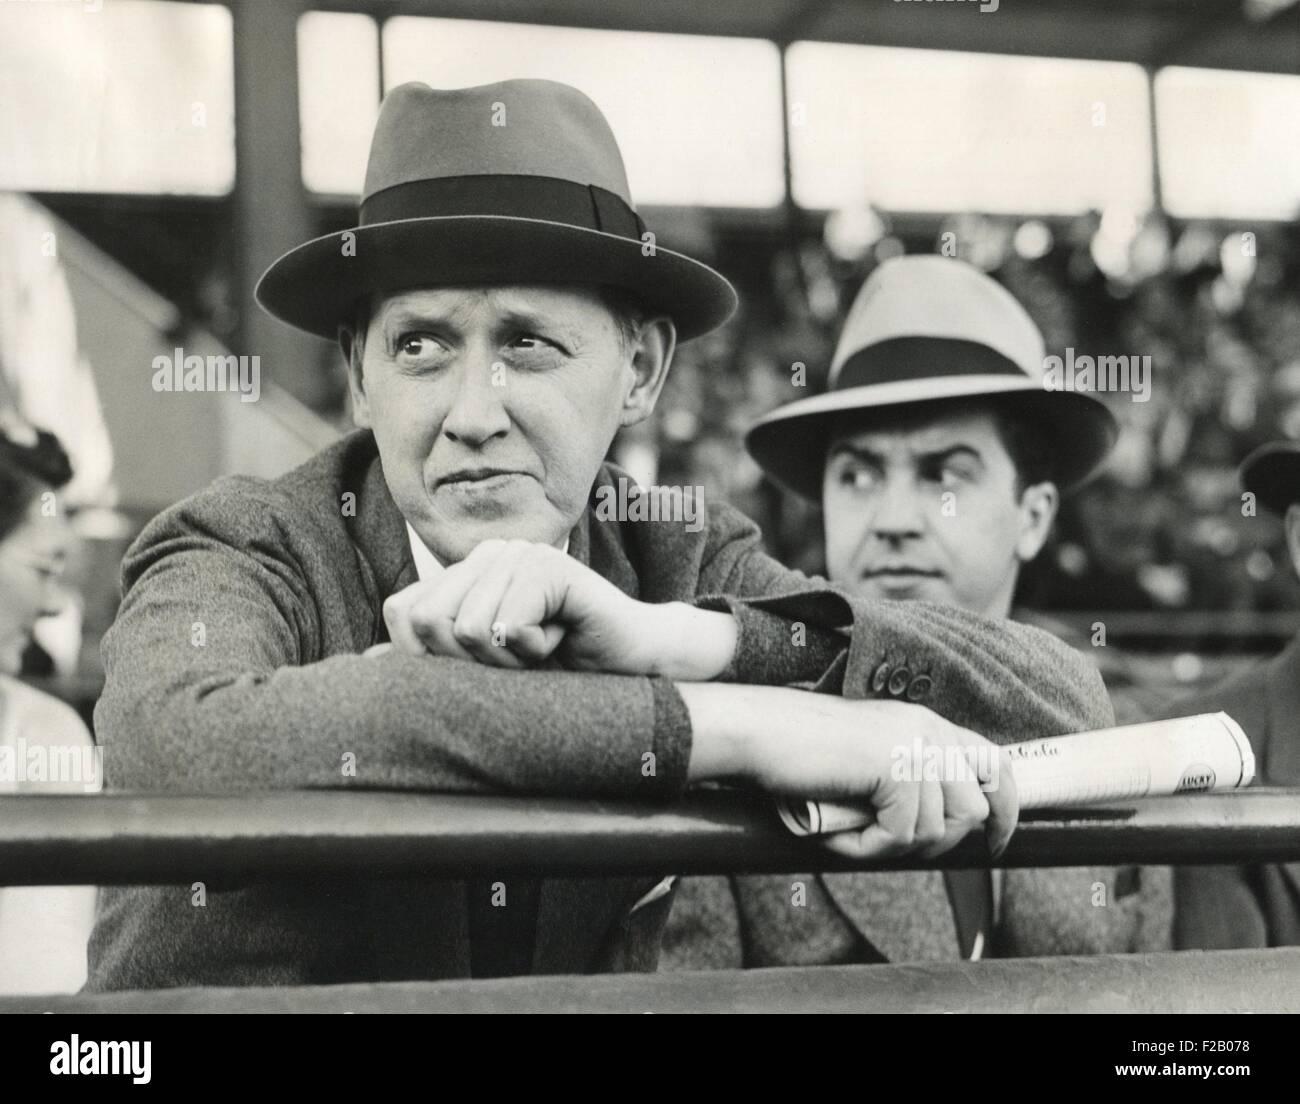 Secretary of Commerce Harry Hopkins watching a Washington-Yankee ball game. April 29, 1940. (CSU 2015 9 1256) Stock Photo